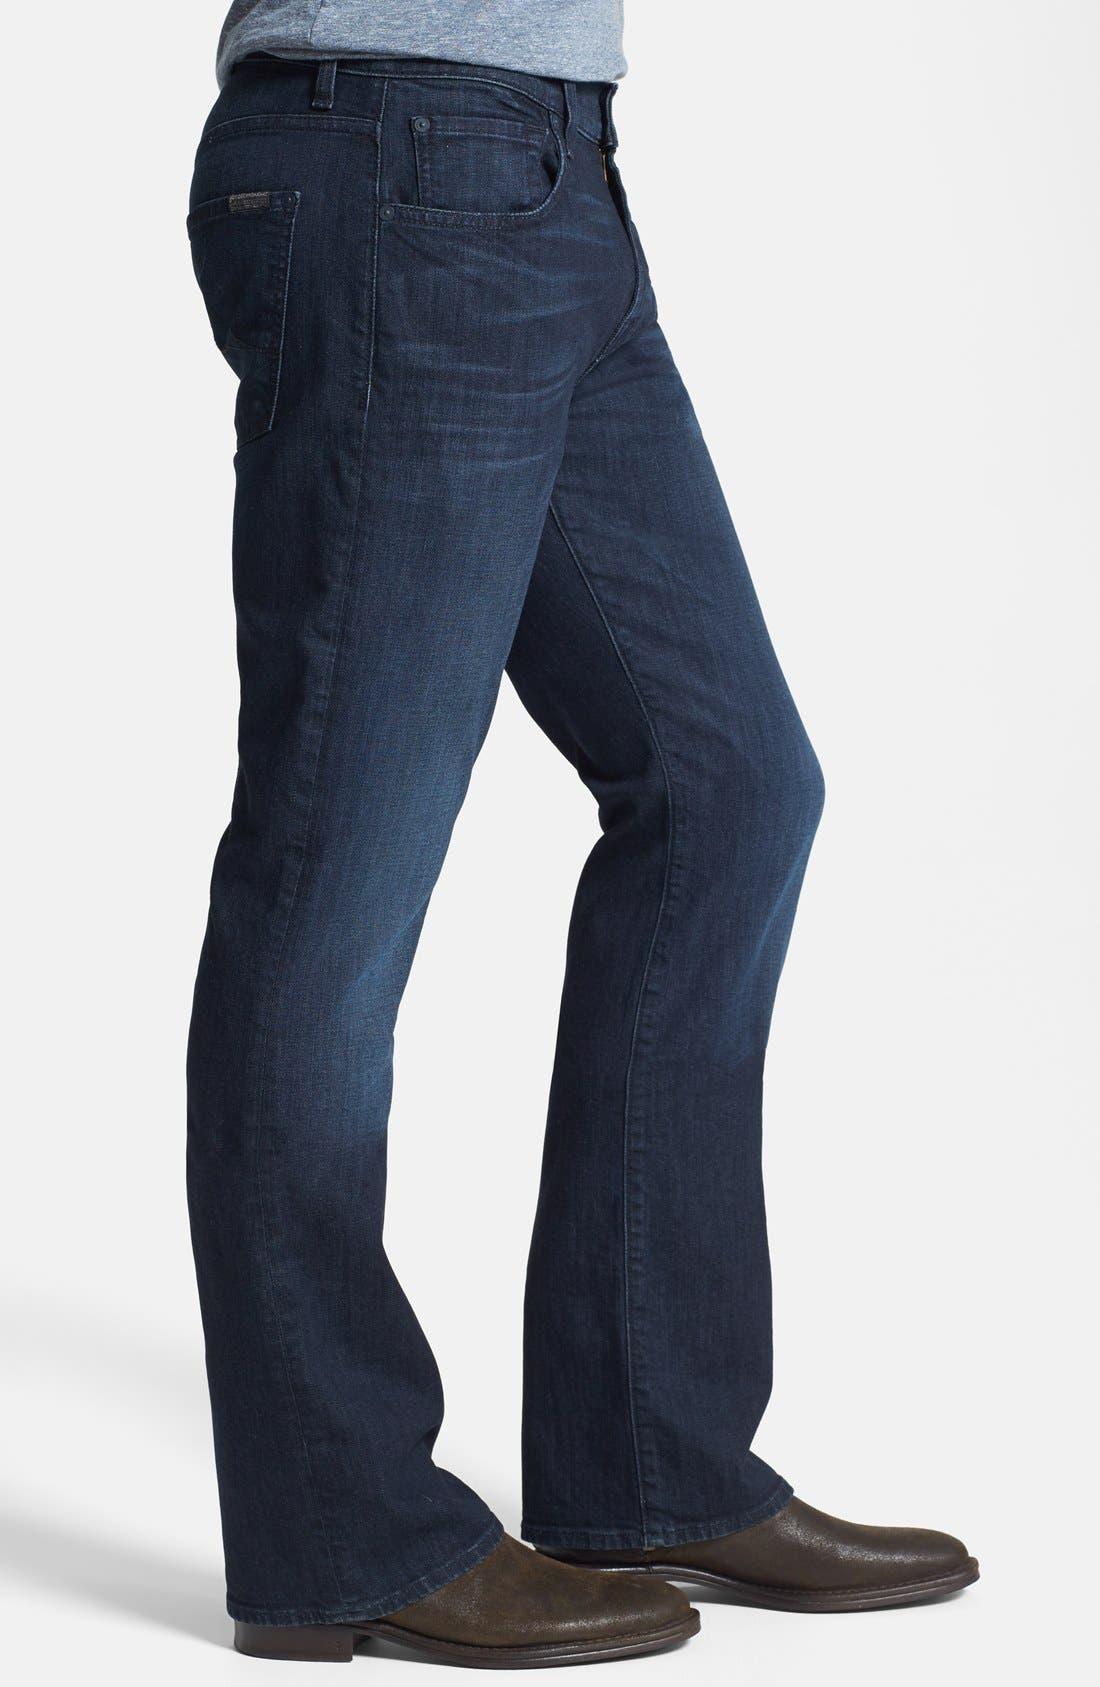 Alternate Image 3  - 7 For All Mankind® 'Brett' Bootcut Jeans (Sunset Hill Blue) (Online Only)